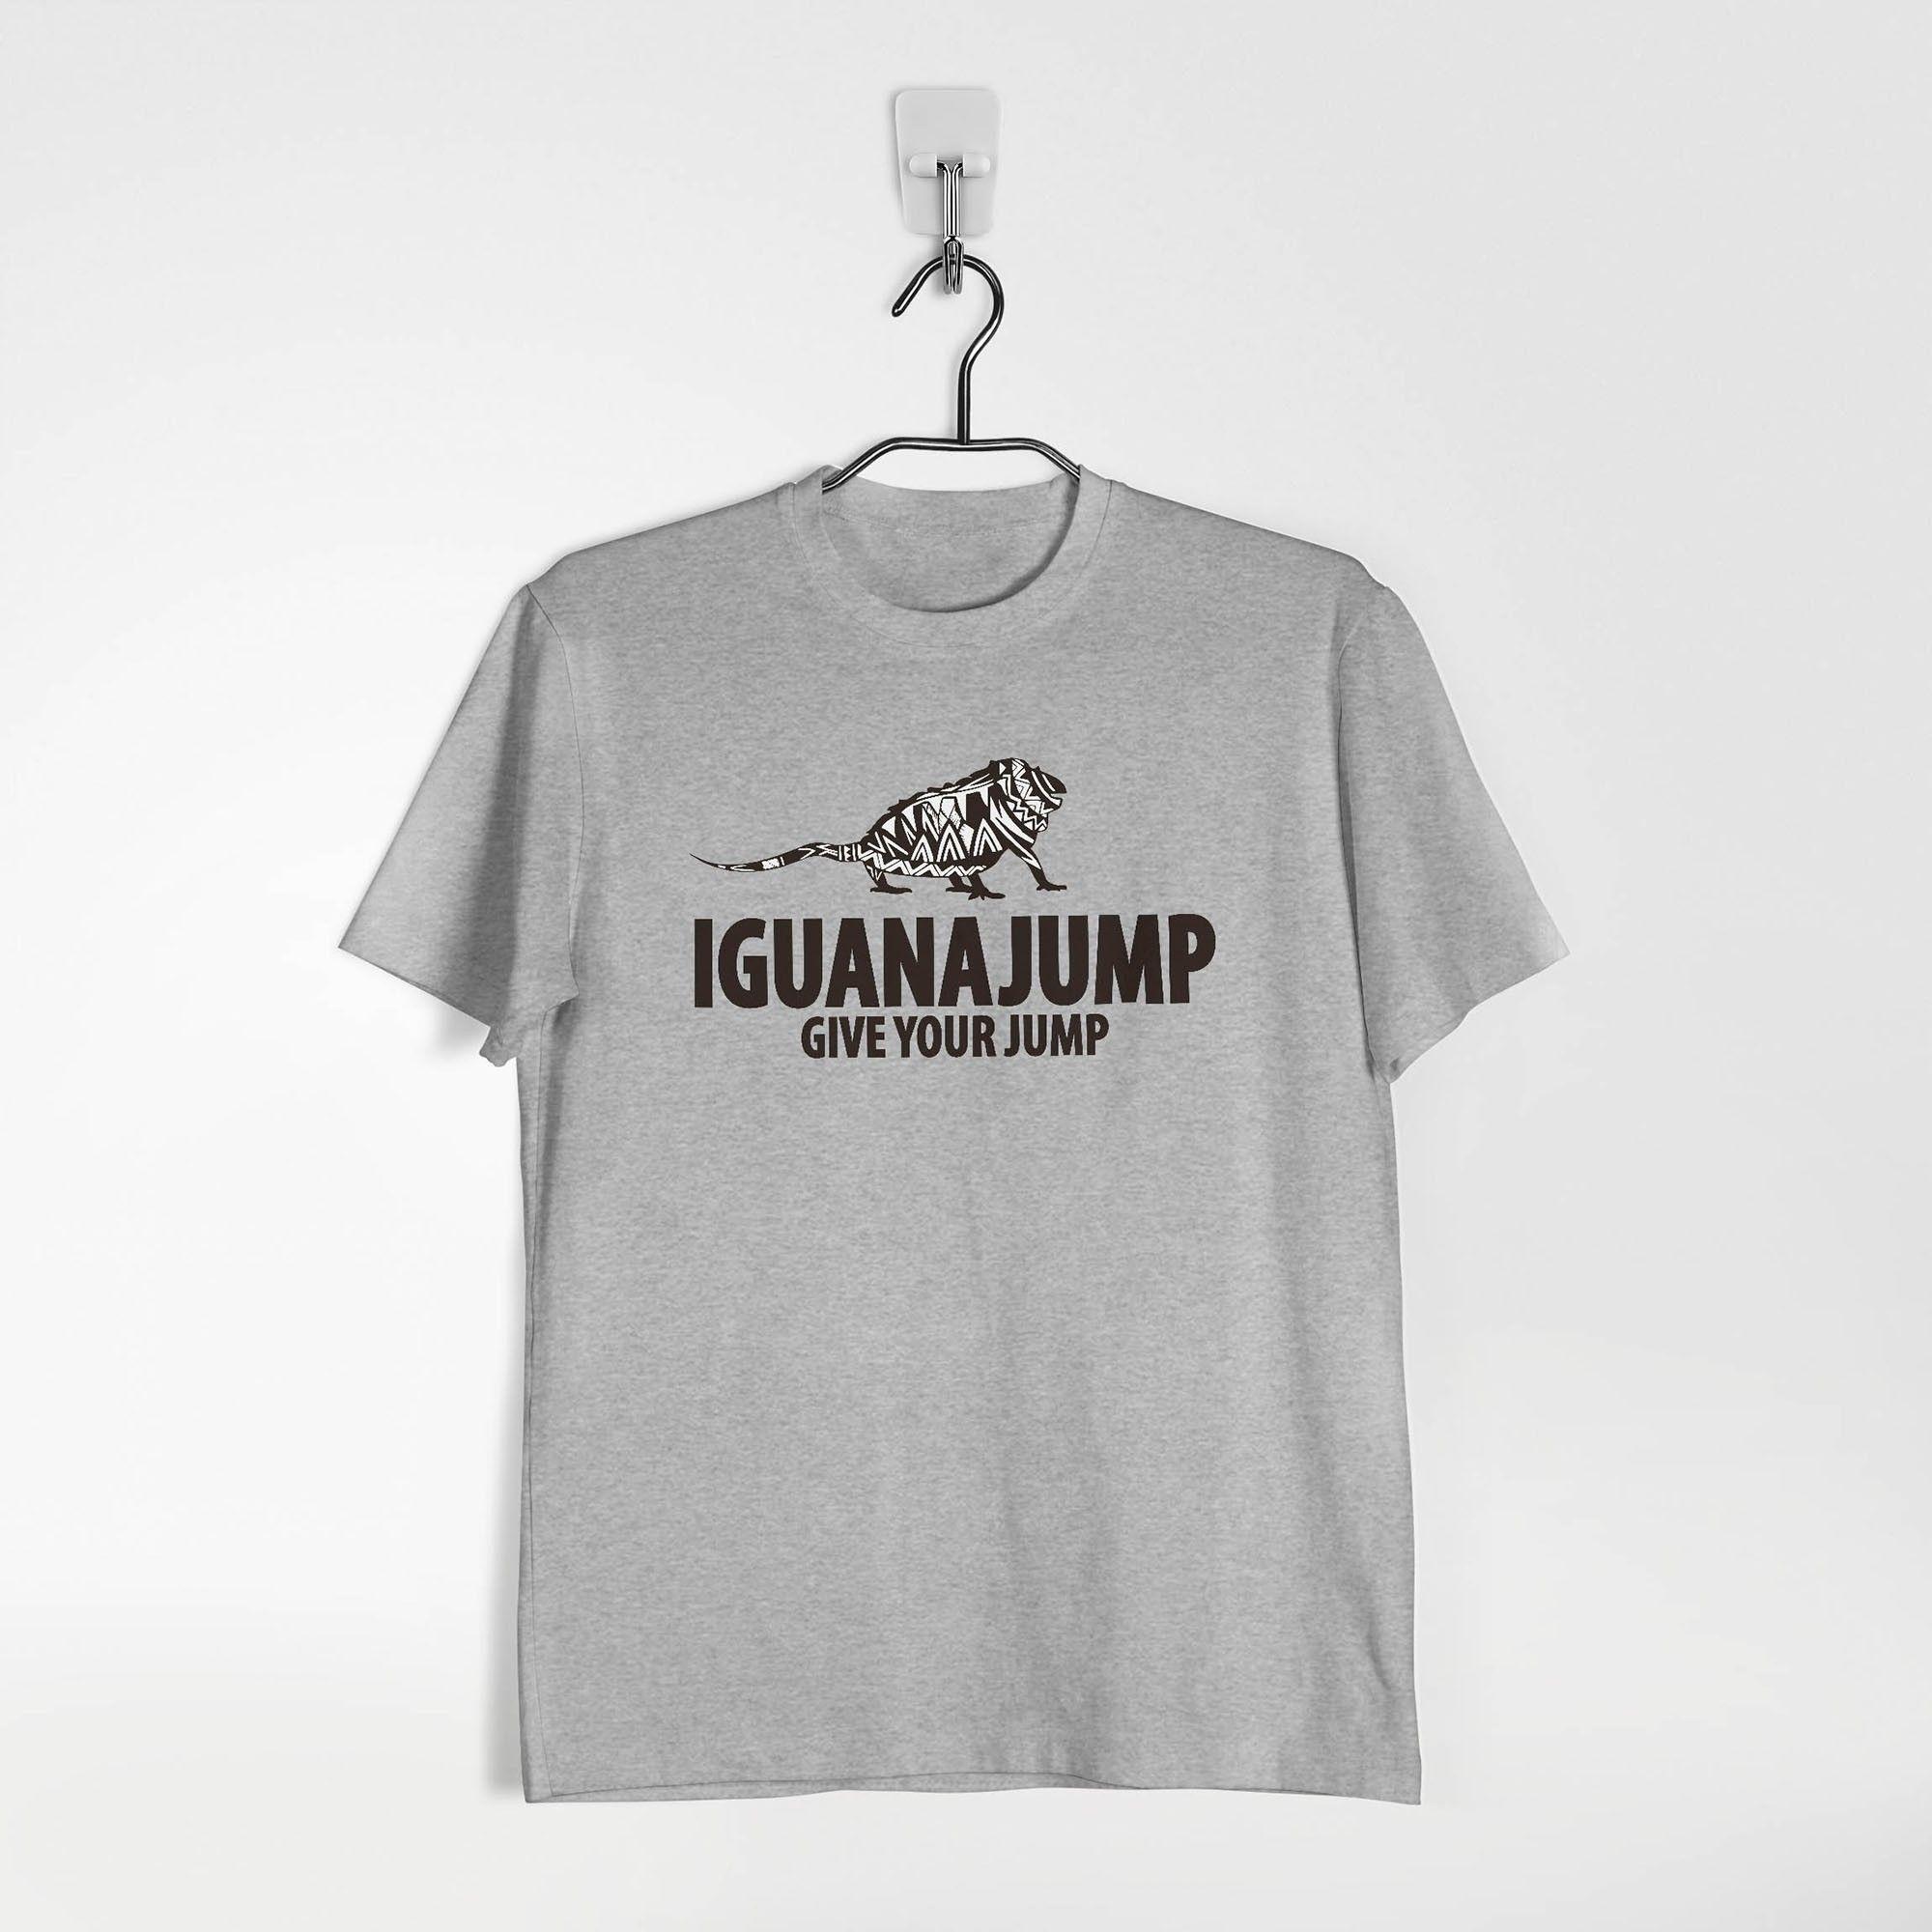 Camiseta cinza mescla masculina roots iguana tribal preta e branca ... 9a32838b20f